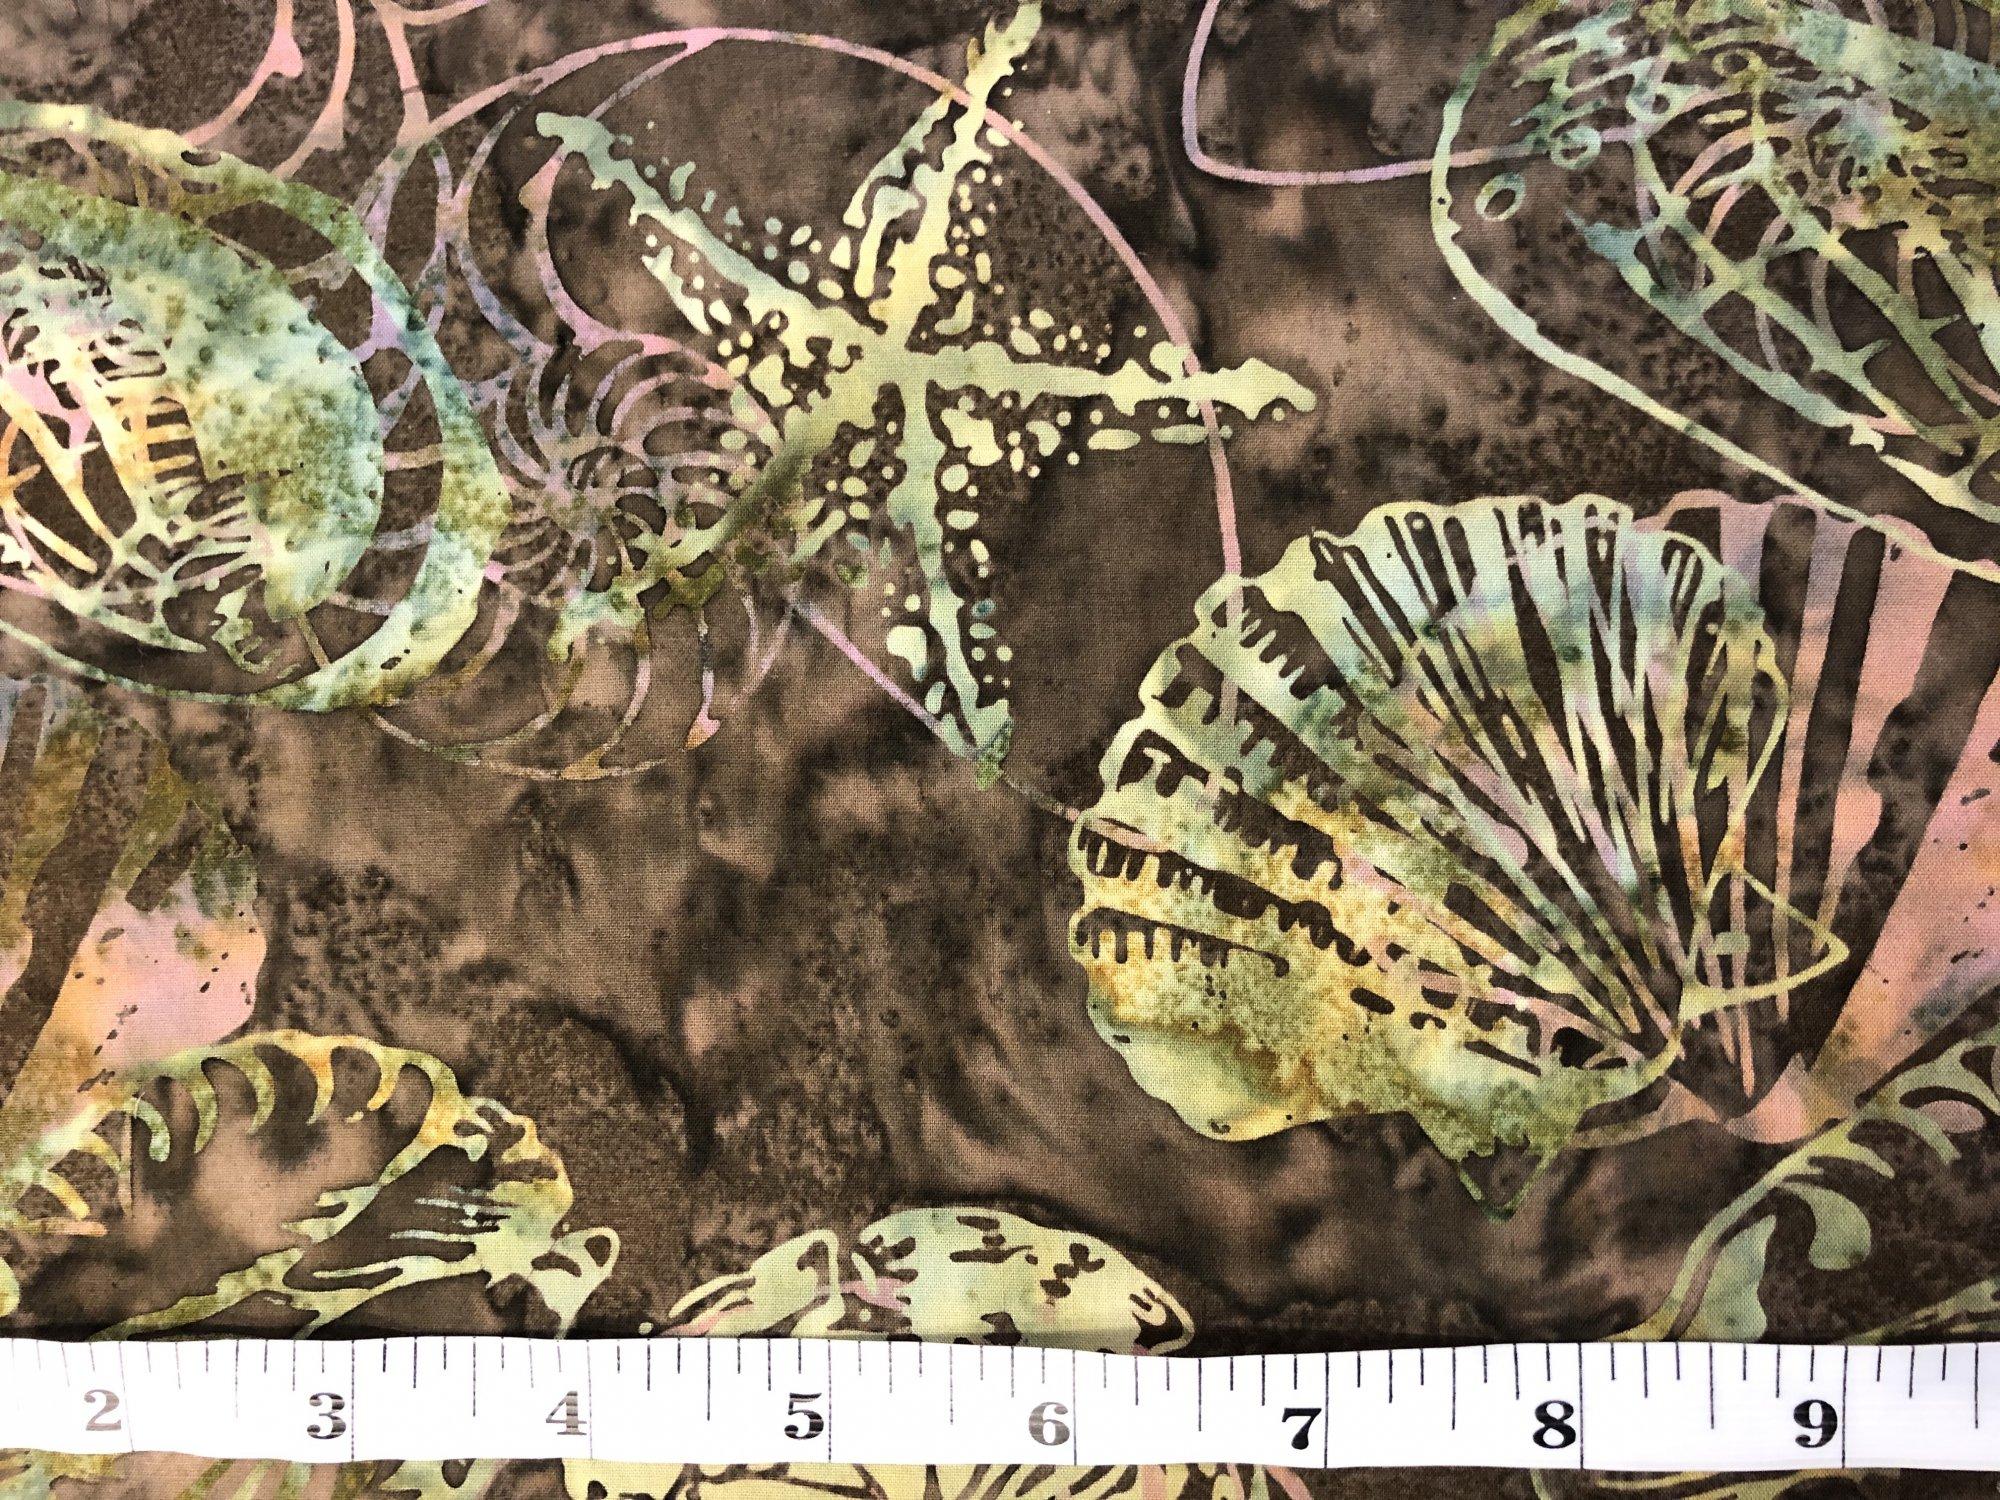 Shells and Starfish - large